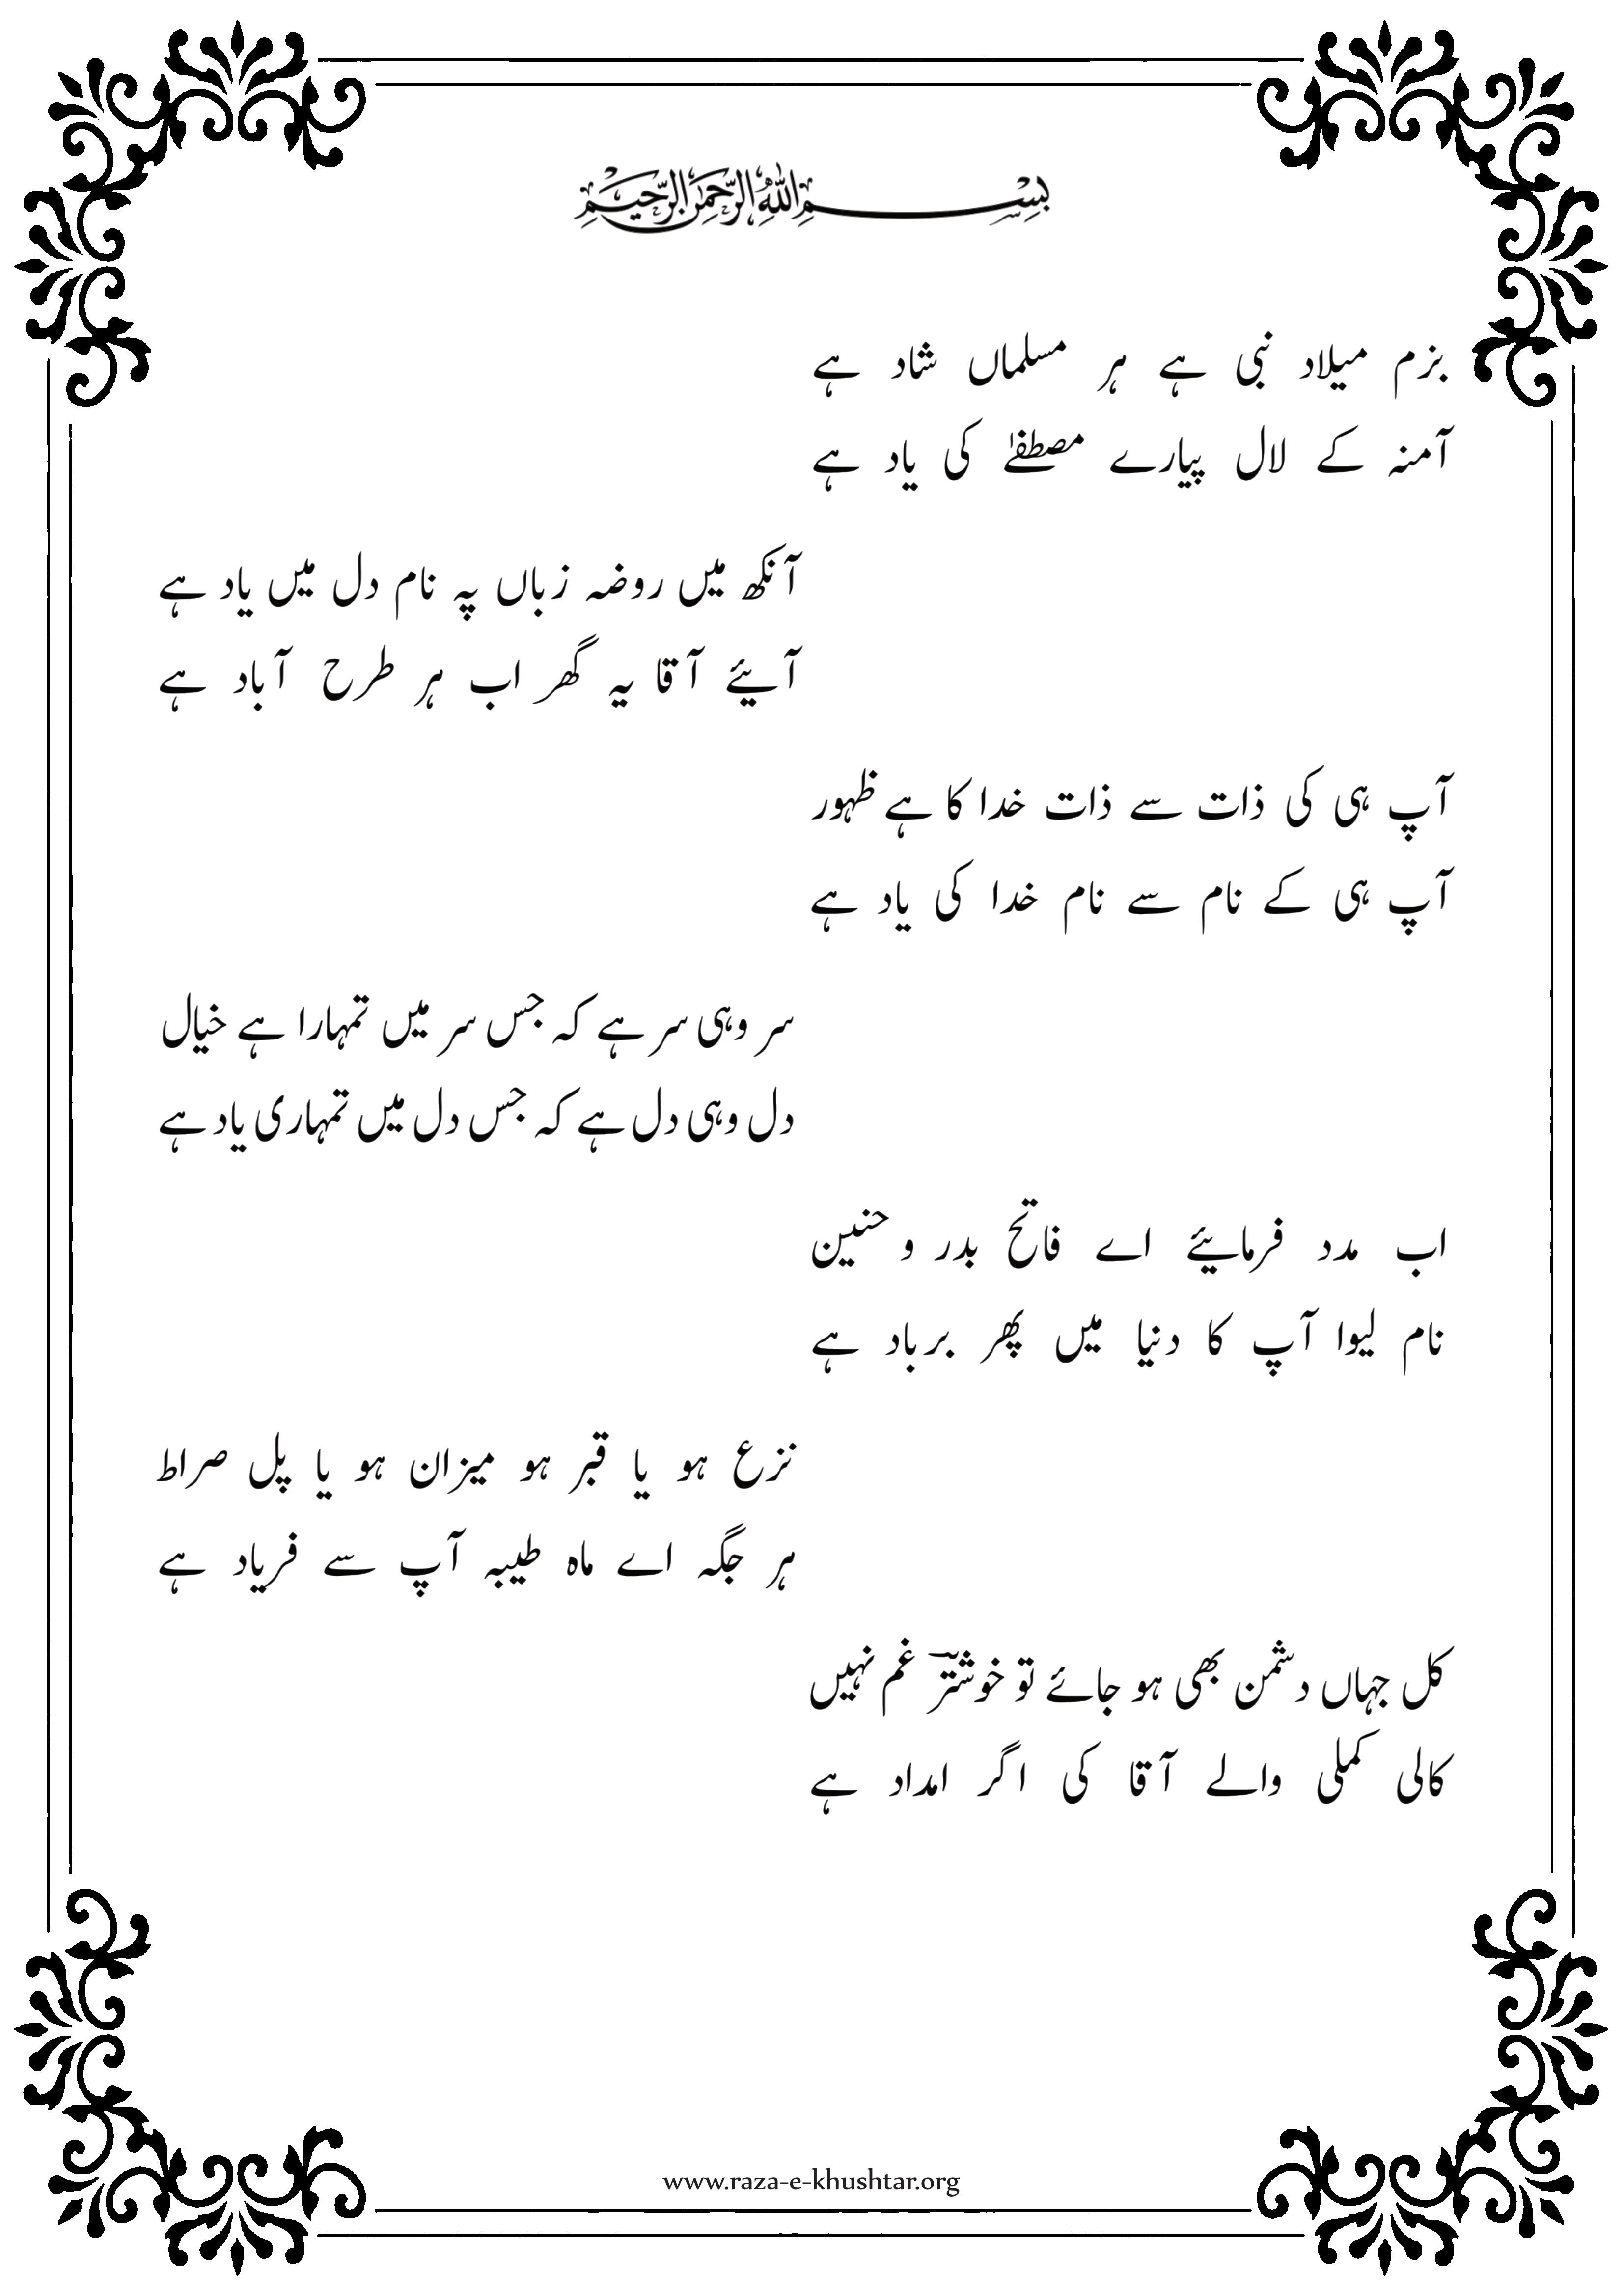 Urdu Naat Lyrics